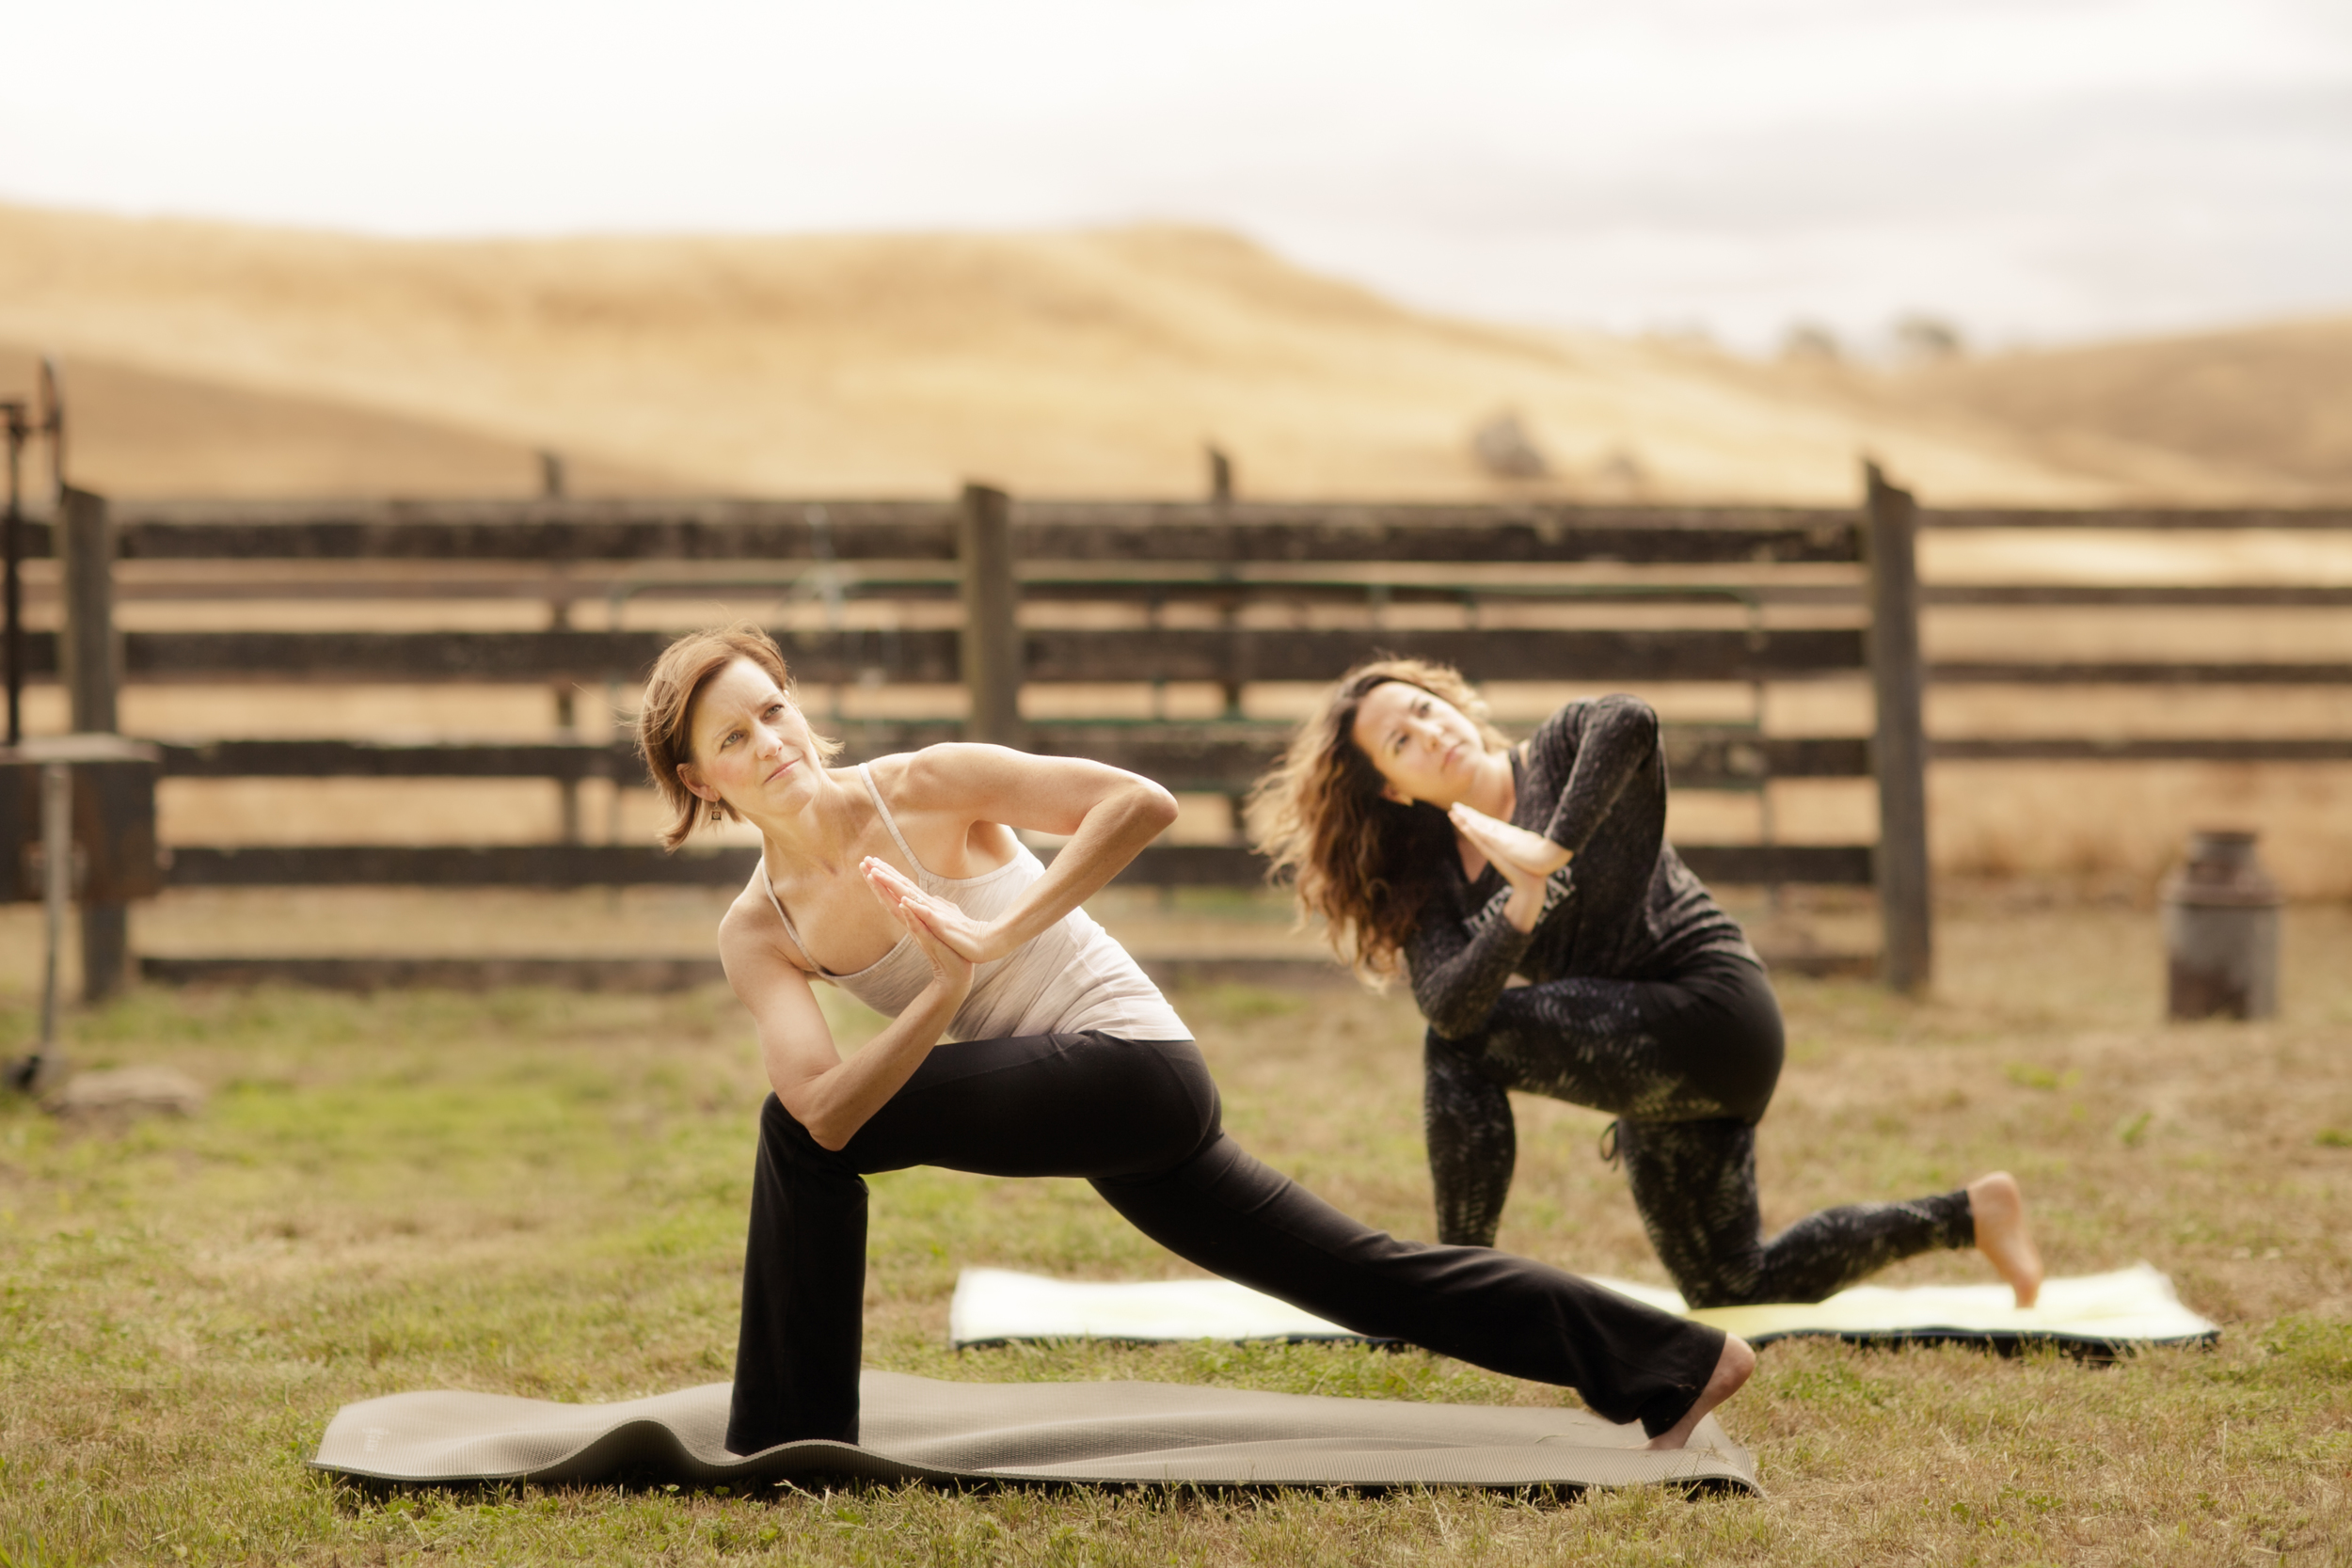 THF_stemple_yoga0165.jpg